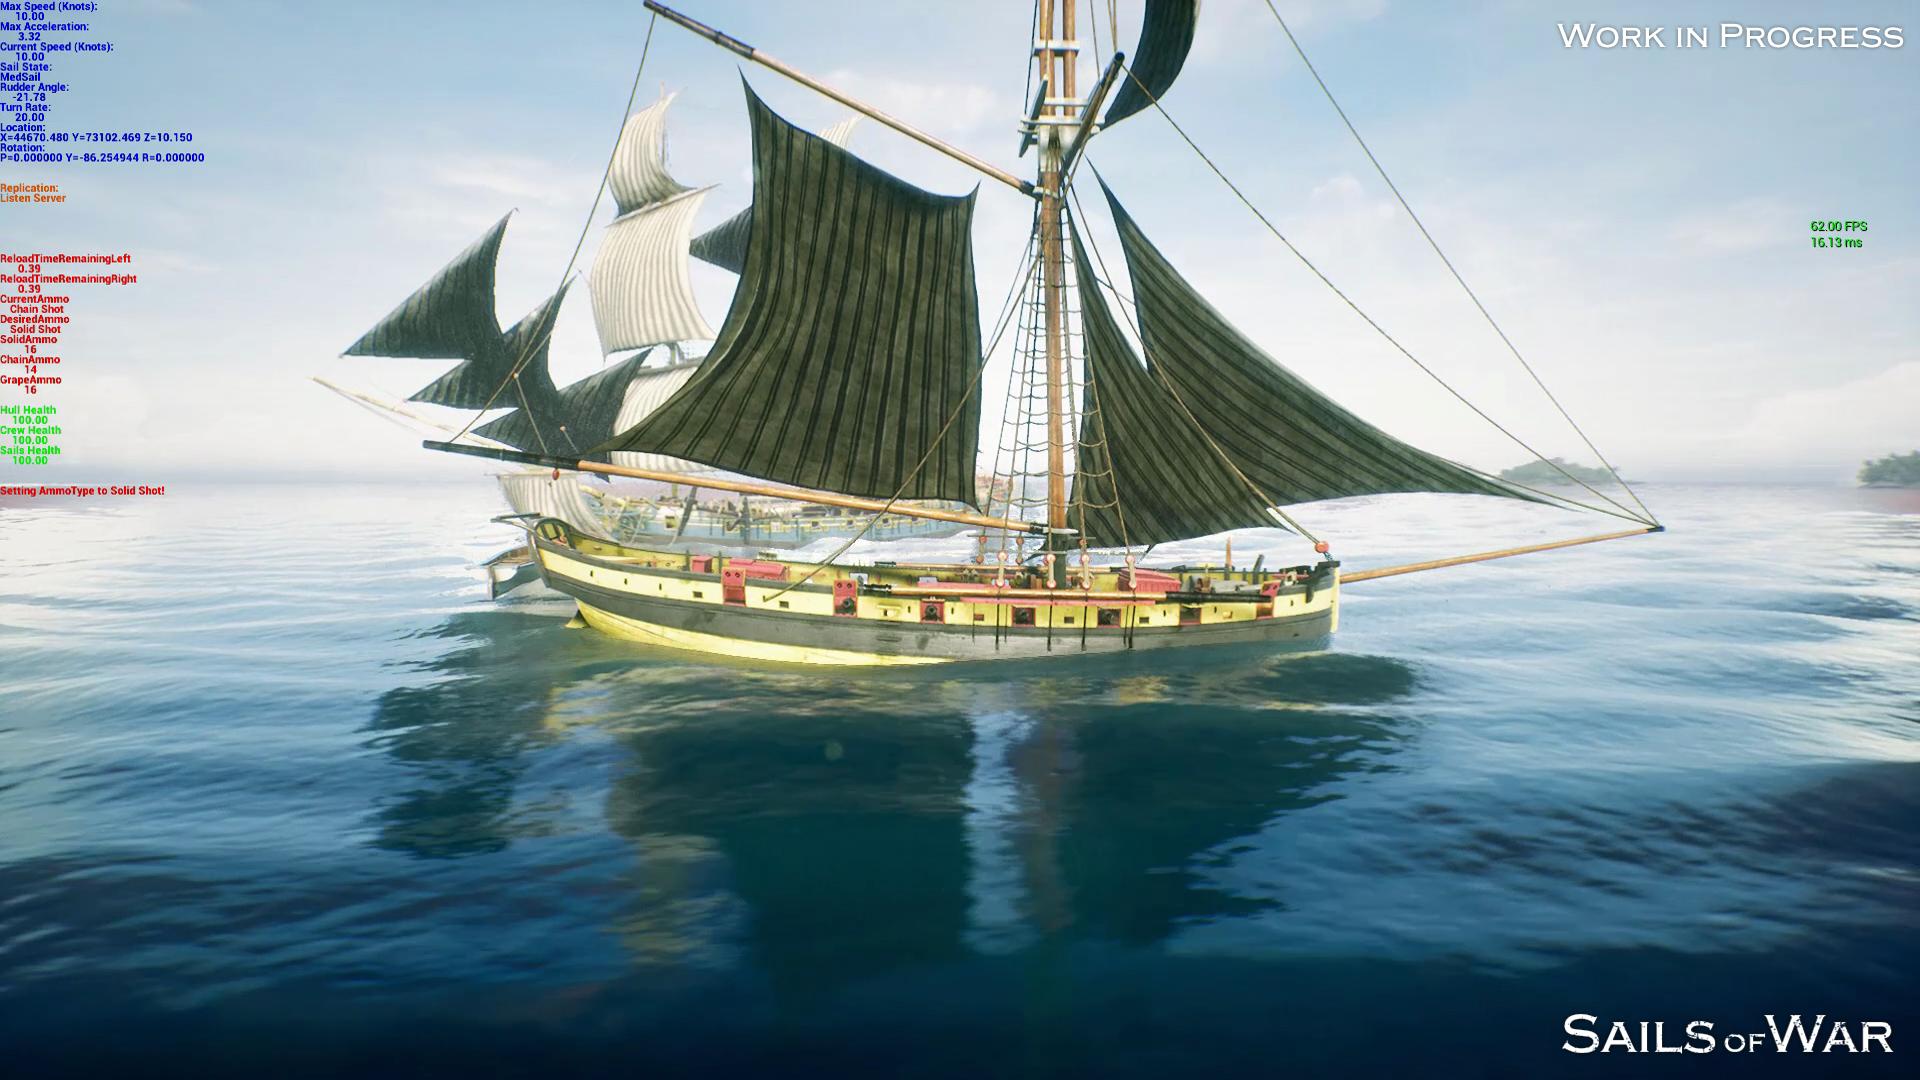 Sails of War Online Play Screenshot Work in Progress